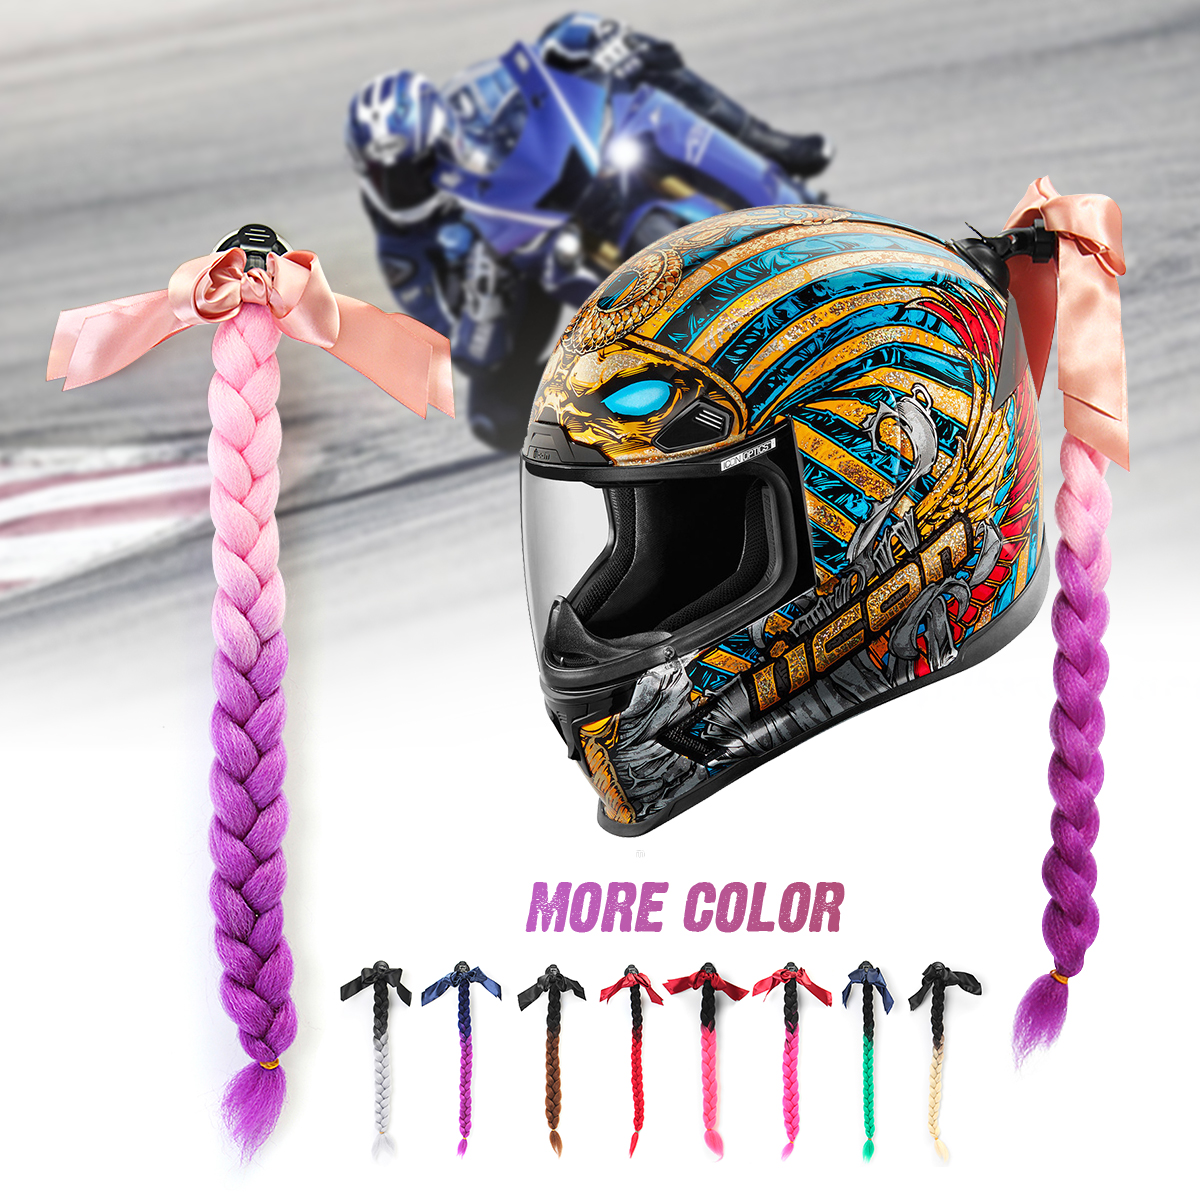 Punk Style Motorcycle Gradient Ramp Helmet Braids Twist Braid Horn Motocross Motorbike Full Face Off Road Moto Decoration